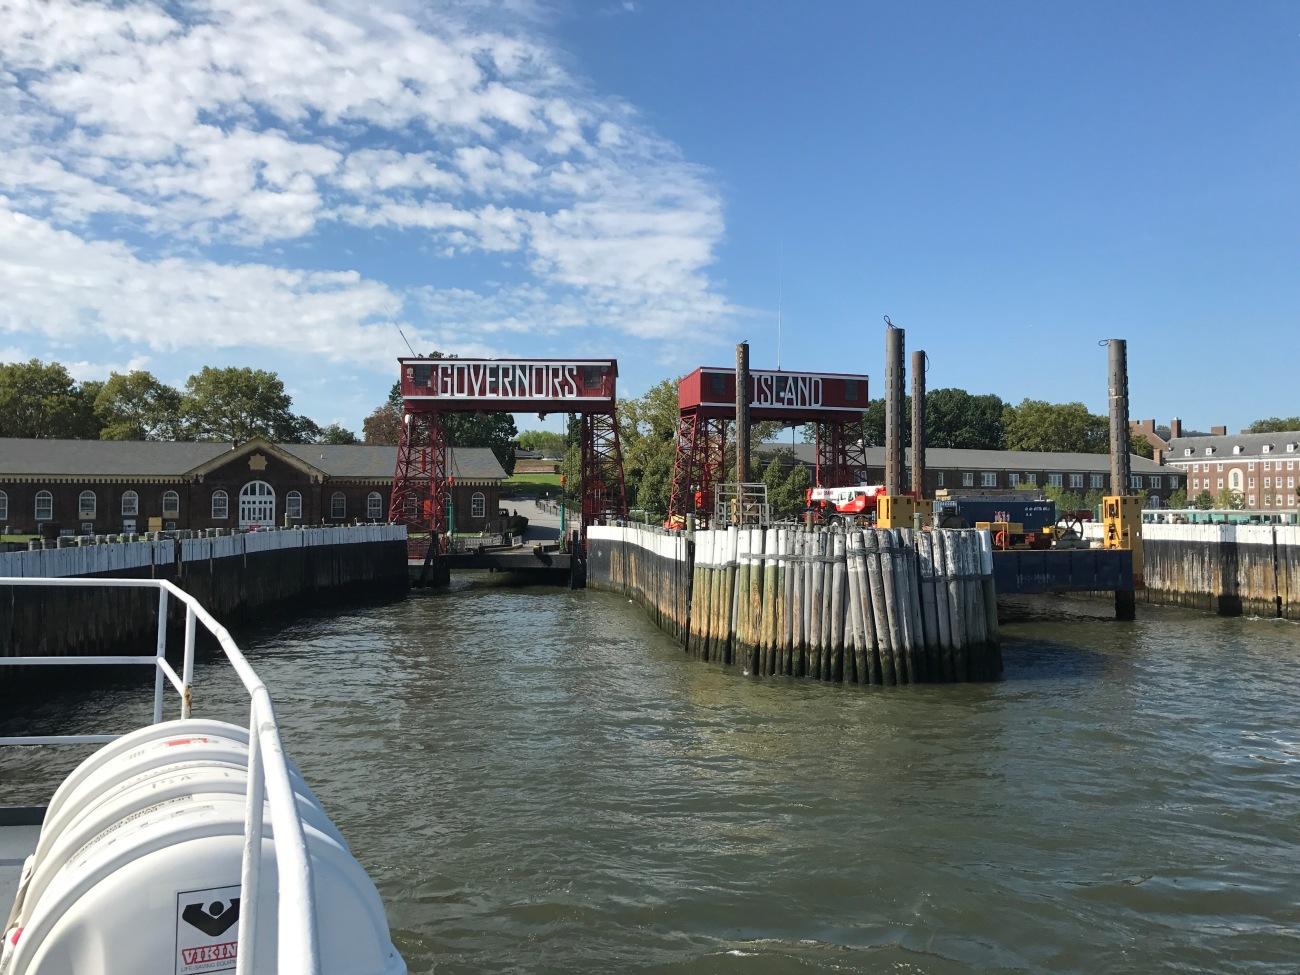 Ferry to Governors Island (WildmooBooks.com)